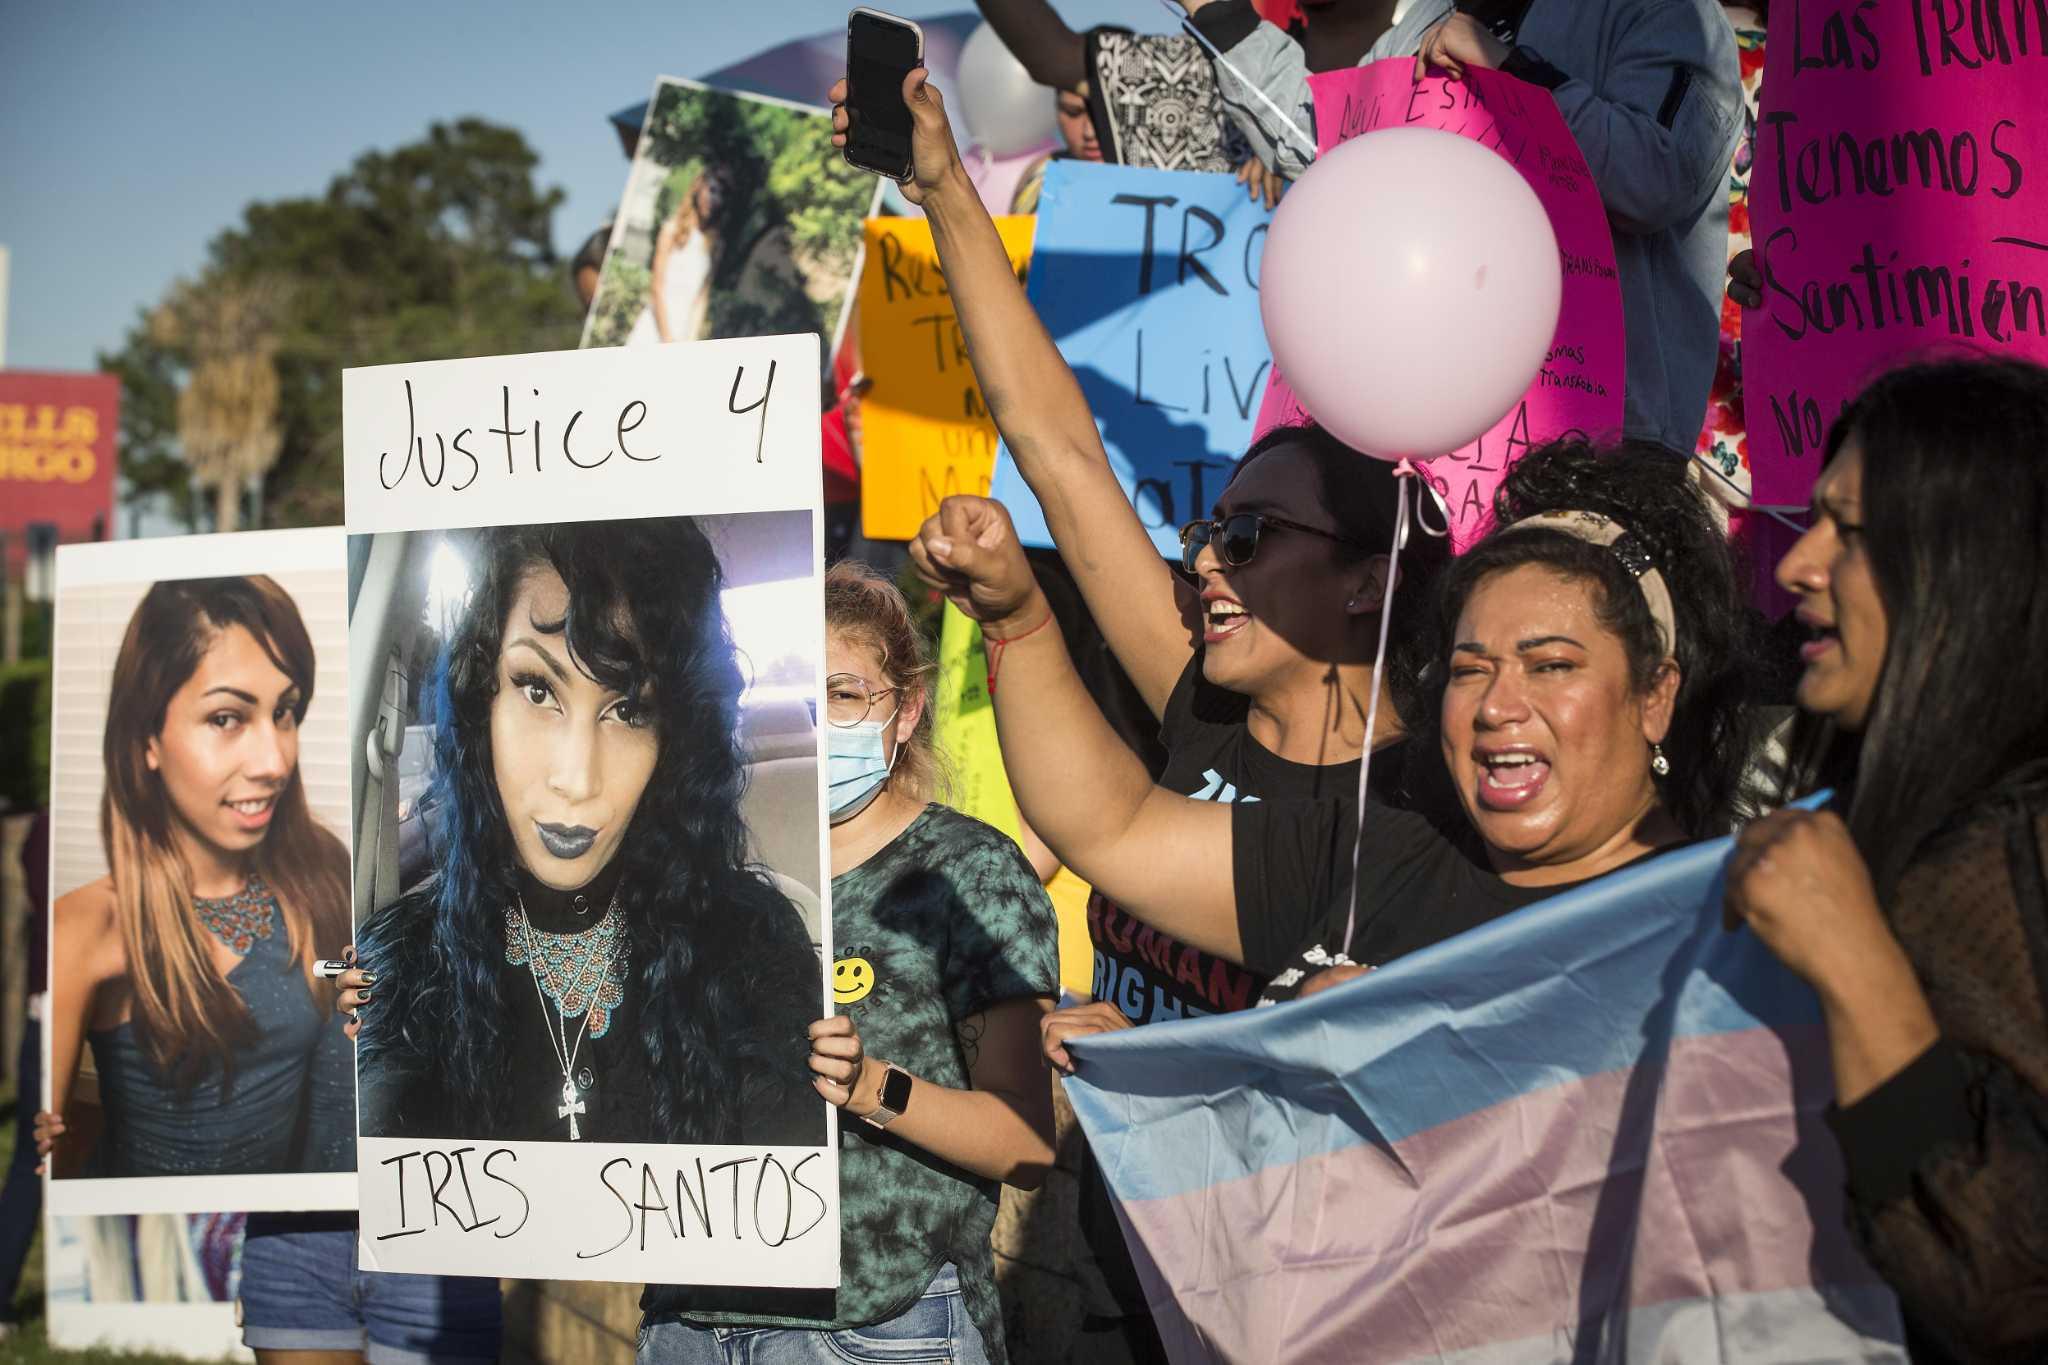 'My heart is bleeding': Transgender woman's shooting death devastates community